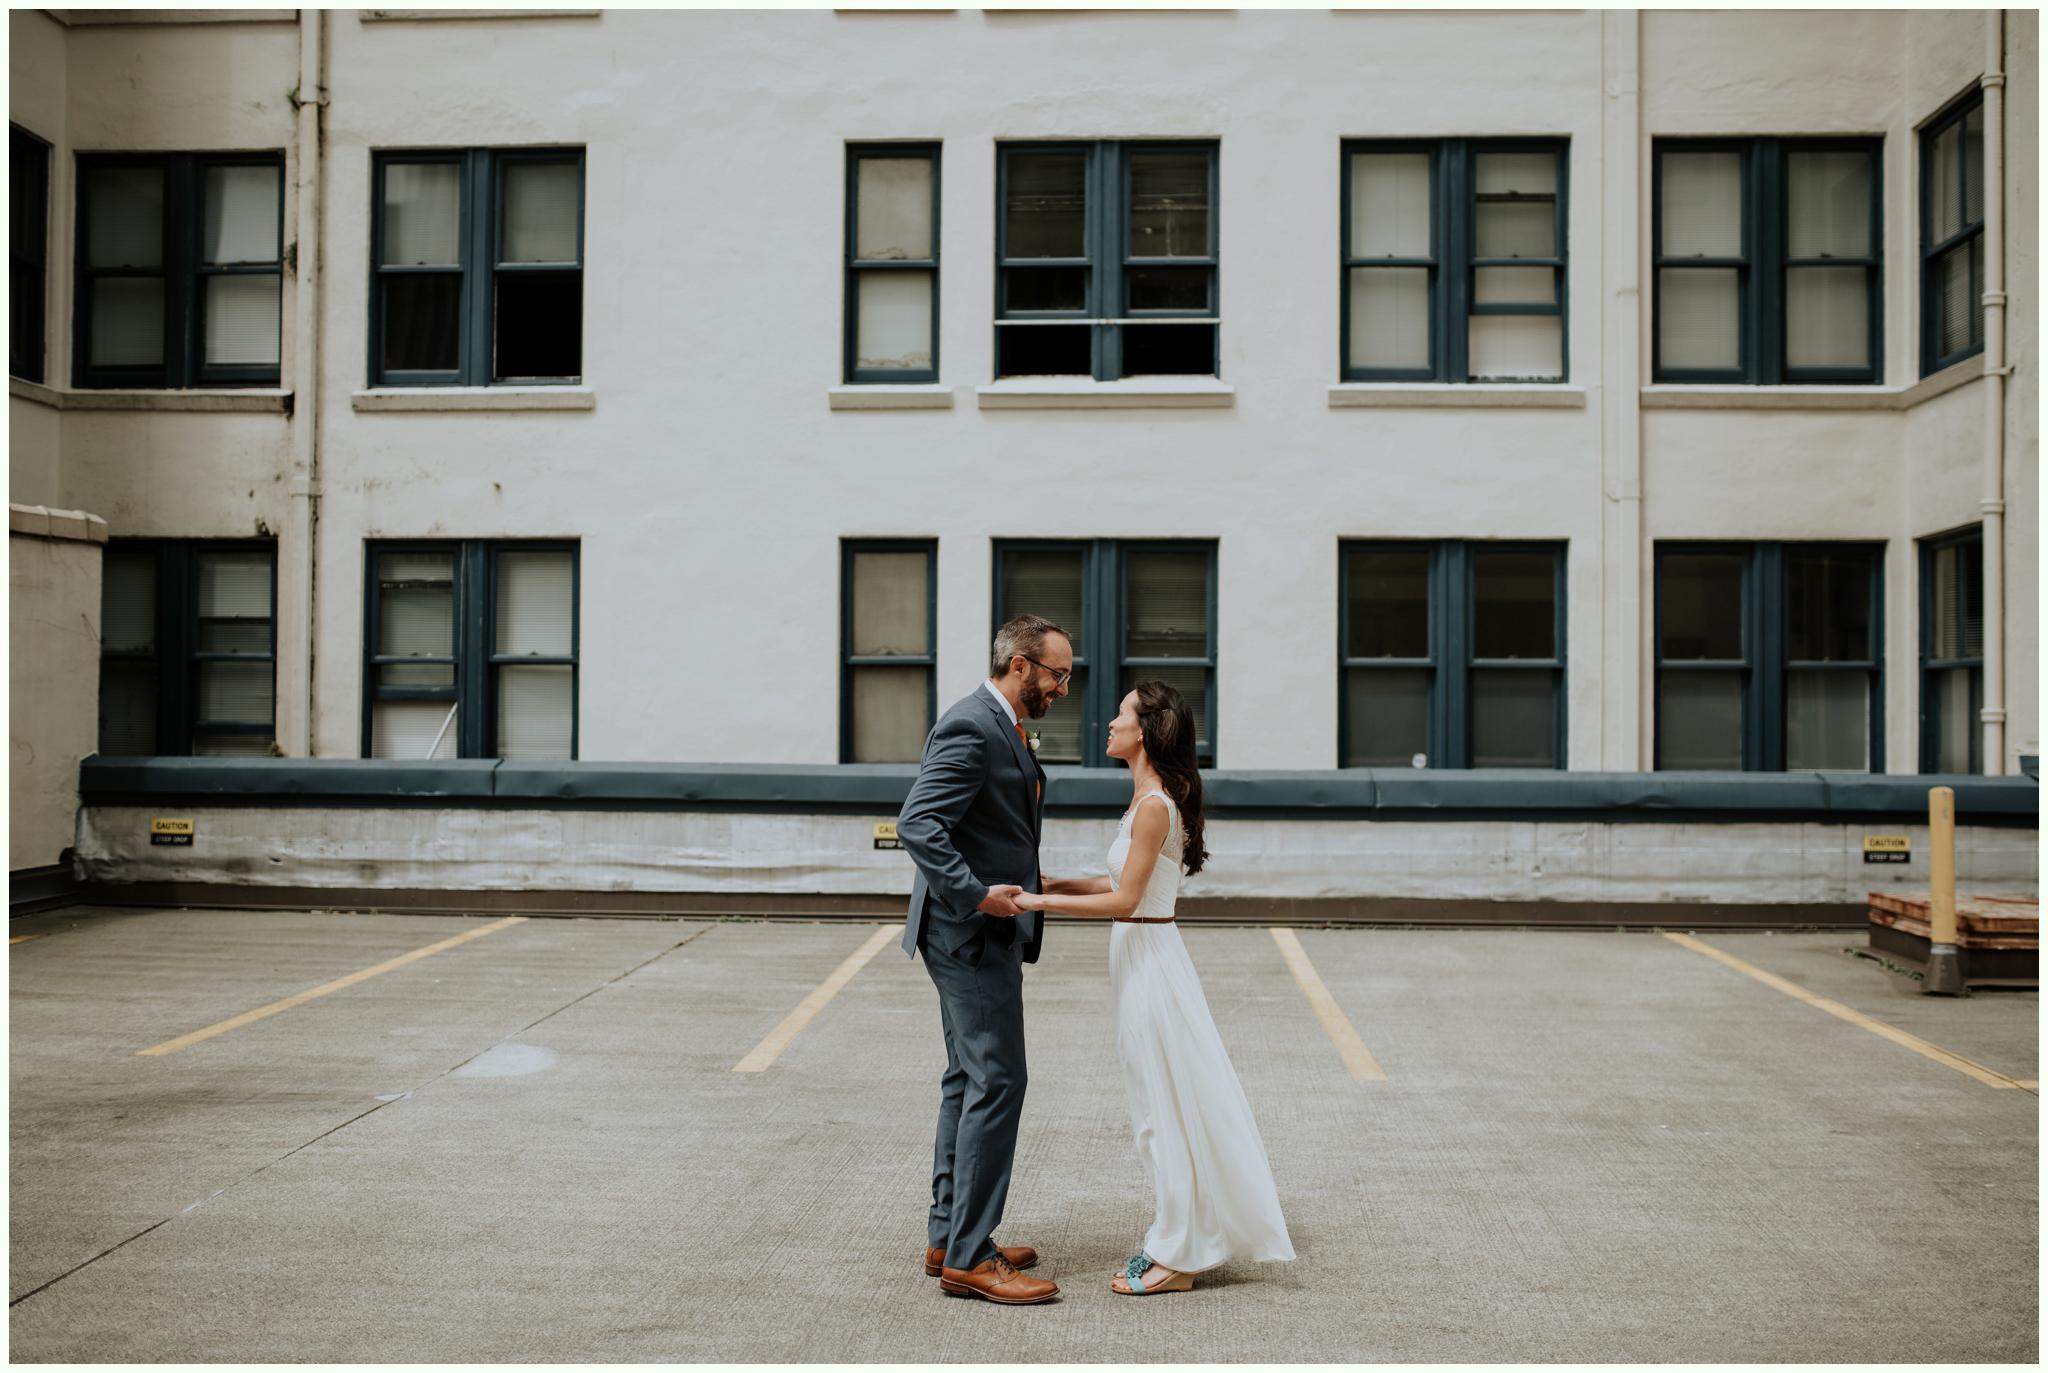 within-sodo-june-wedding-seattle-photographer-caitlyn-nikula-31.jpg